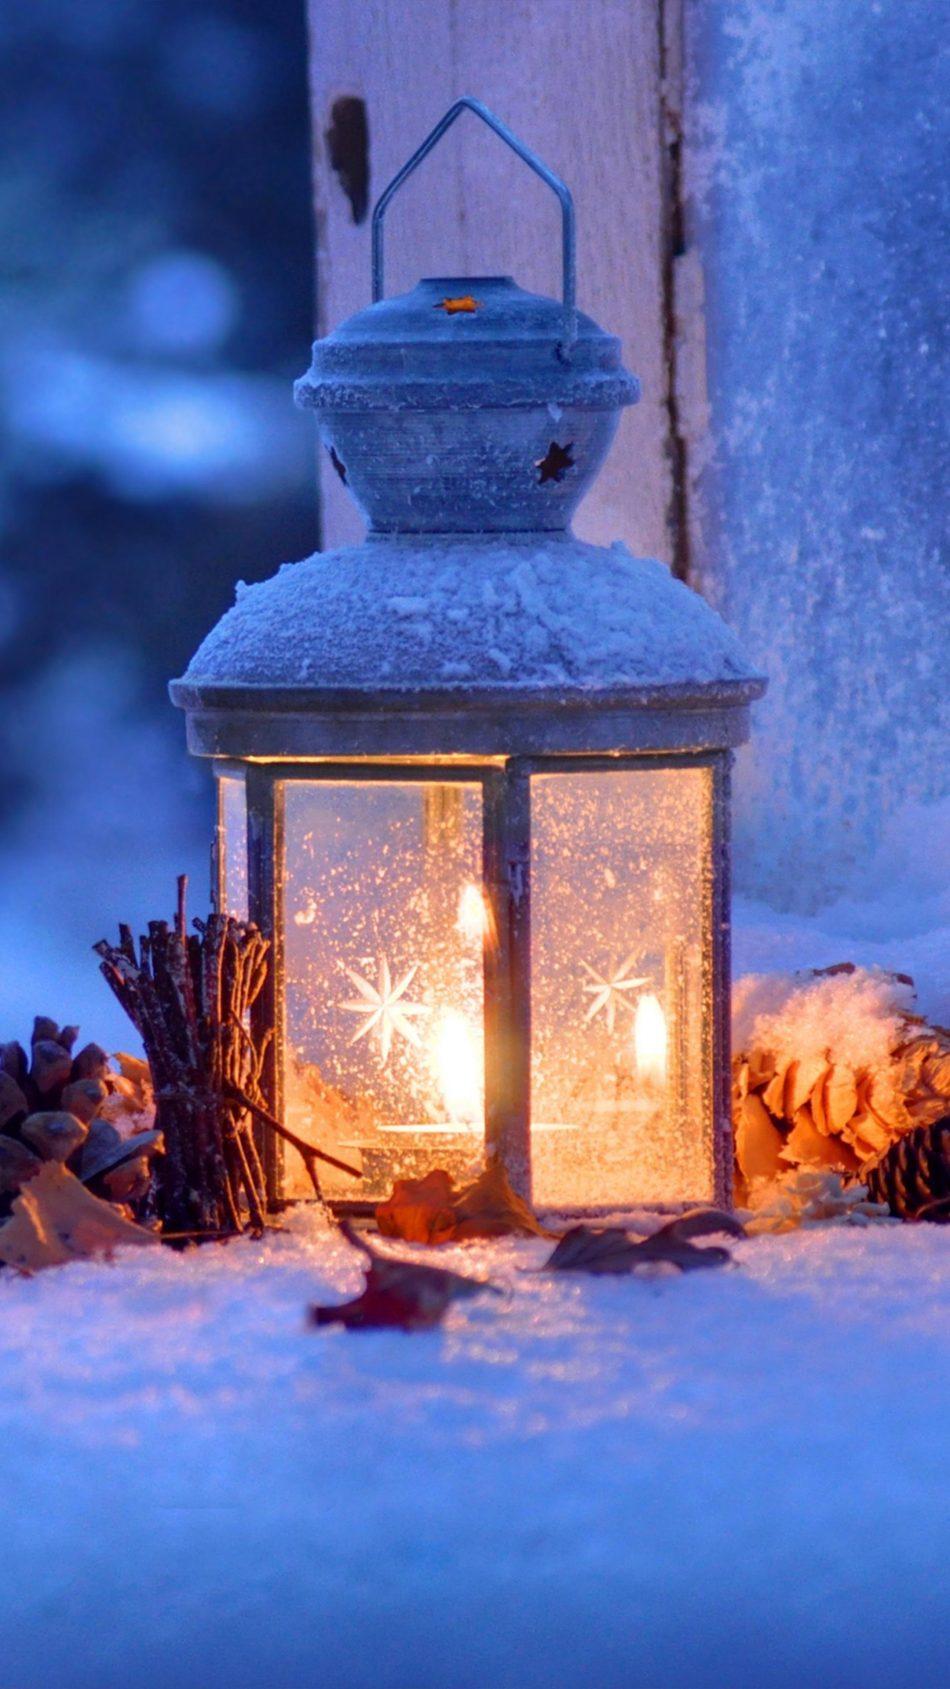 Lantern Snow Winter Christmas Eve 4K Ultra HD Mobile Wallpaper